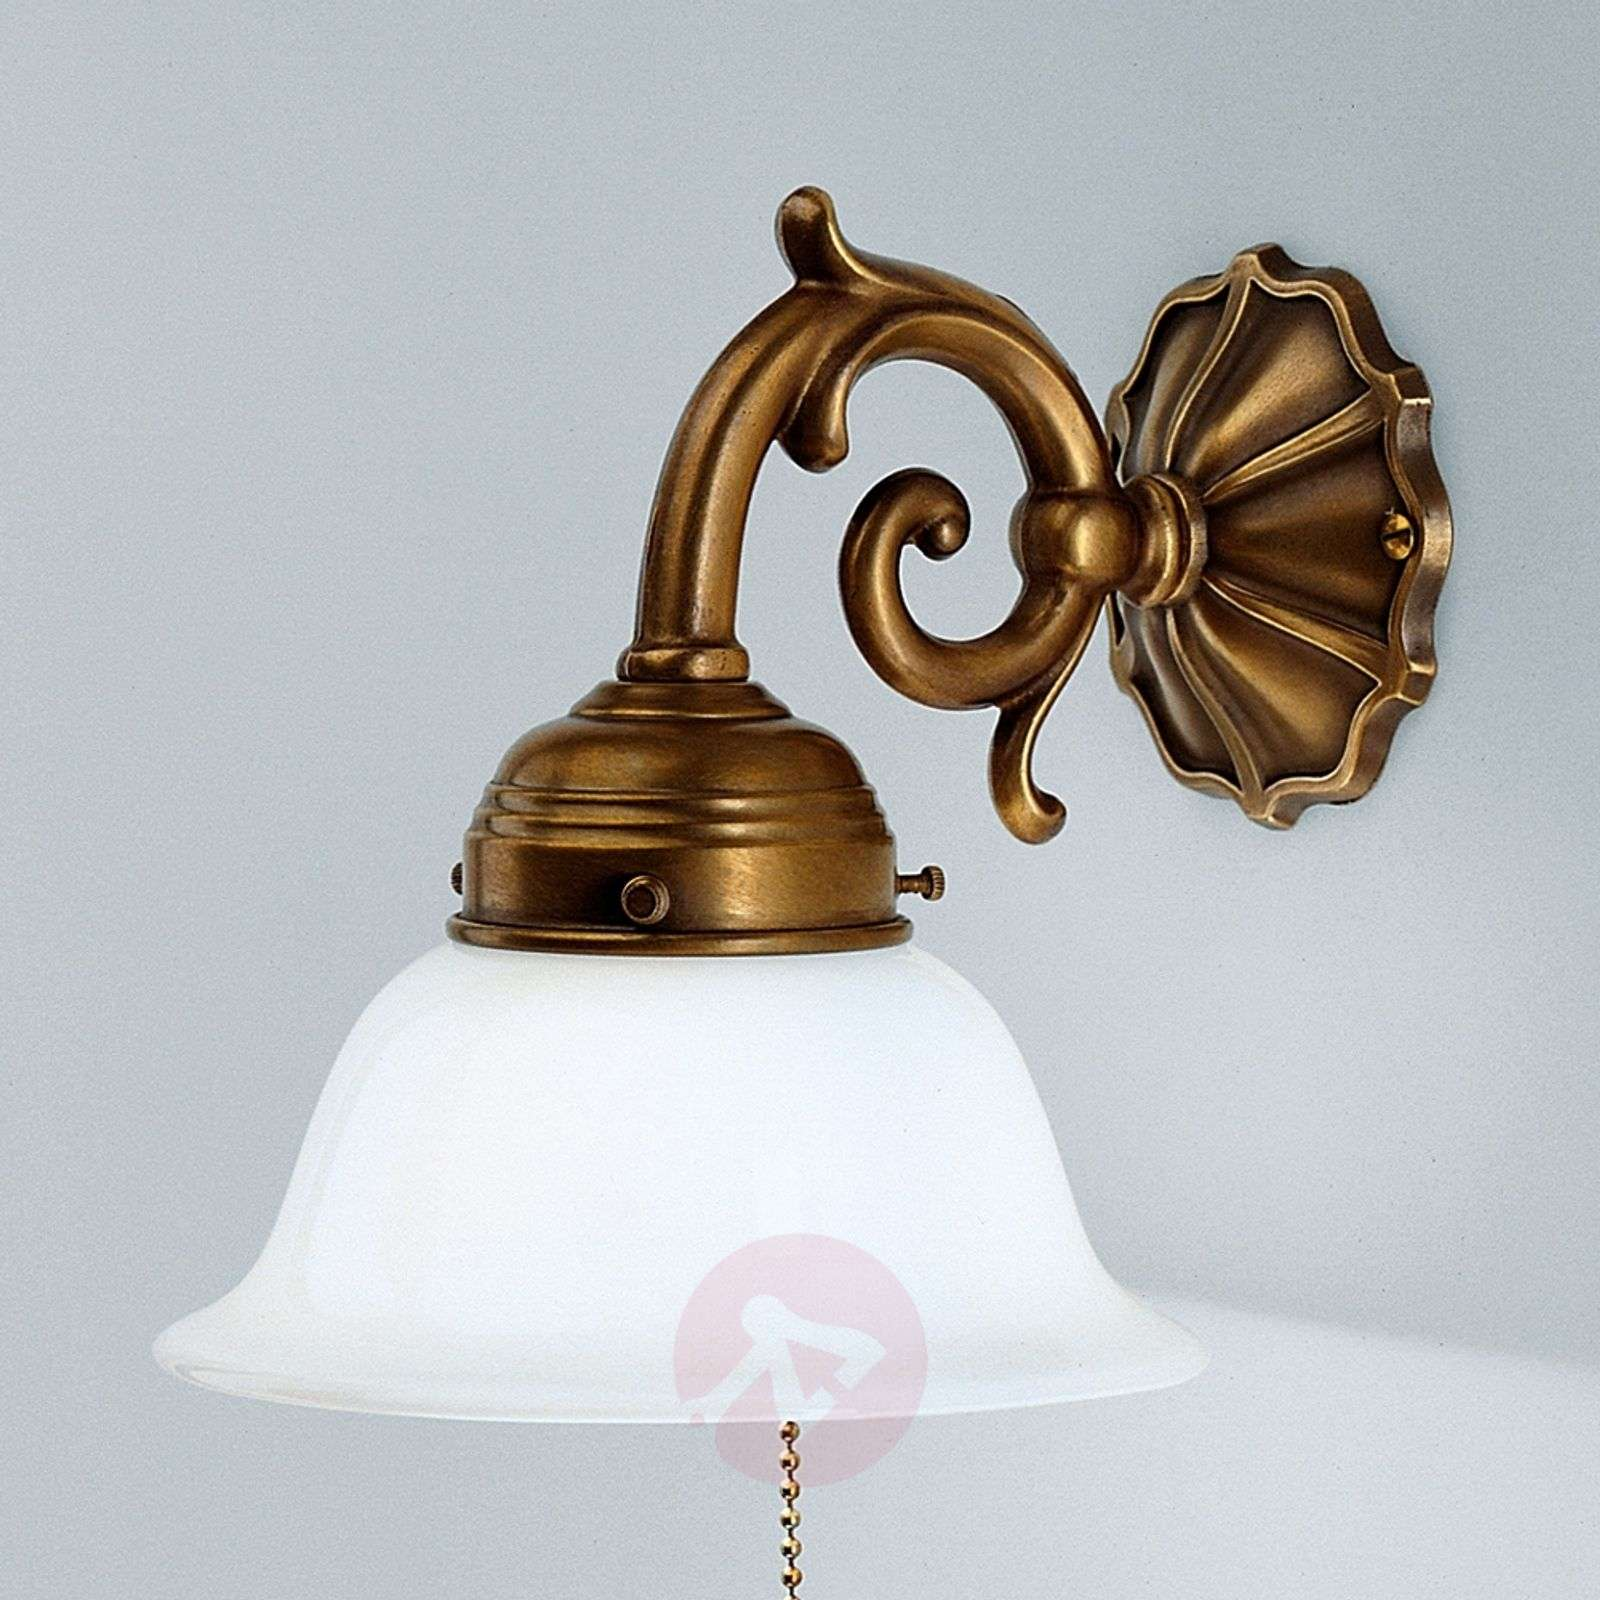 EDGAR brass wall light with chain pull_1542035_1